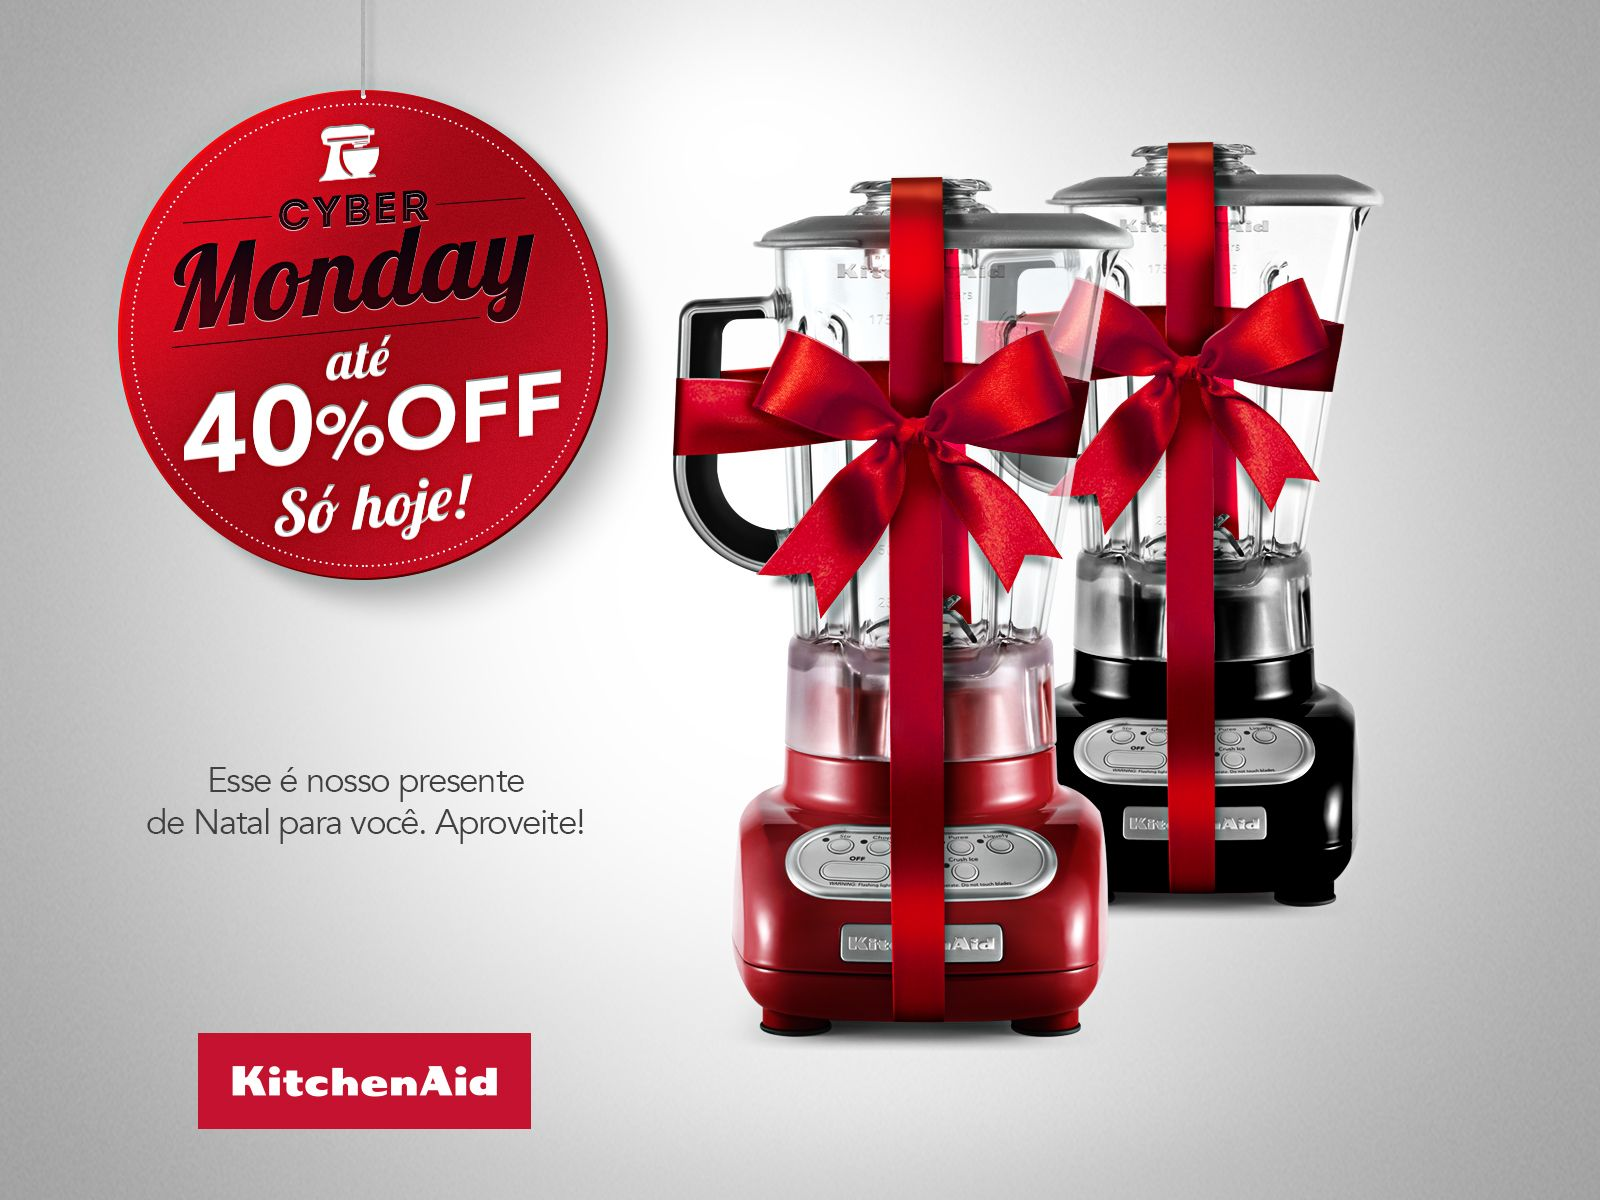 Cyber Monday Kitchenaid Keyvisual On Behance Cyber Monday Kitchen Aid Black Friday Ads